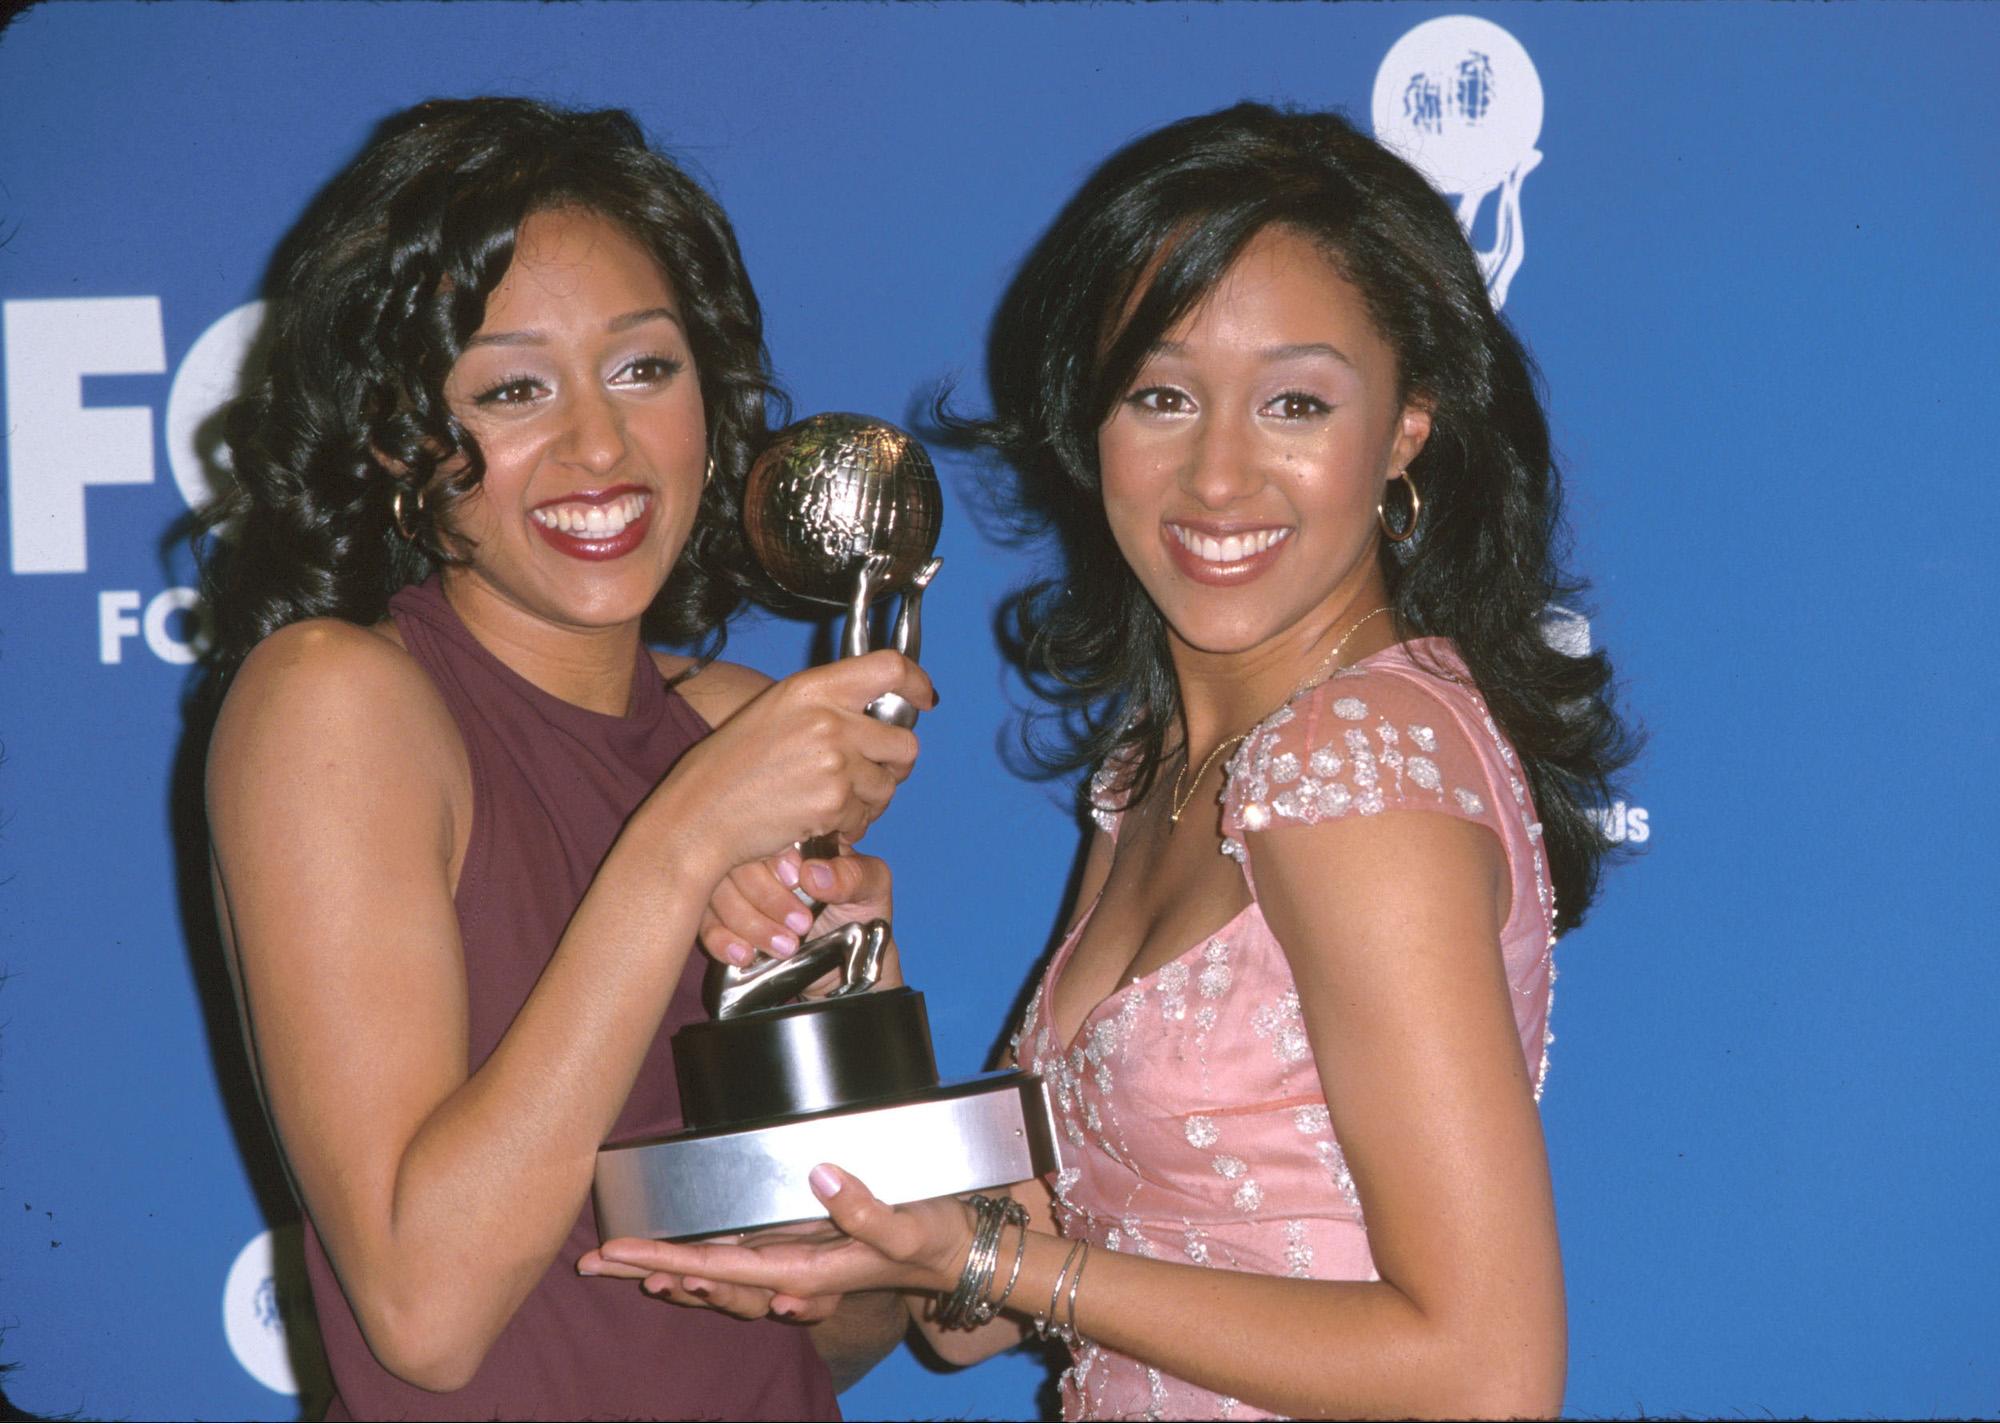 Tia & Tamera Mowry at the 31st Annual NAACP Awards, February 12, 2000.